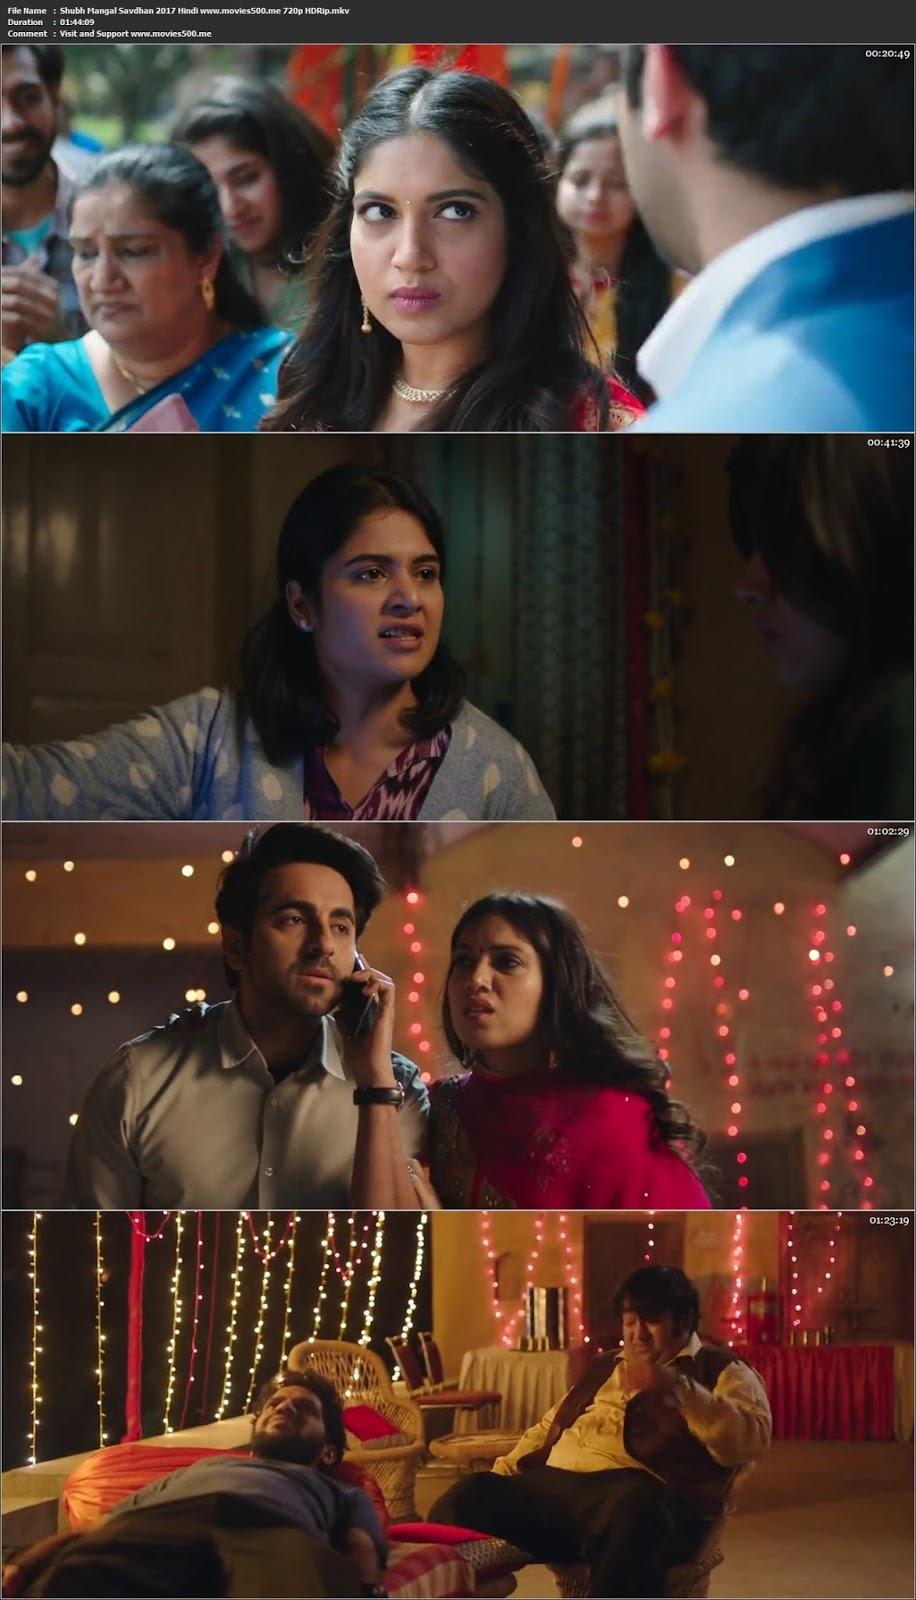 Shubh Mangal Saavdhan 2017 Hindi Movie Desi DVDRip 720p at movies500.me